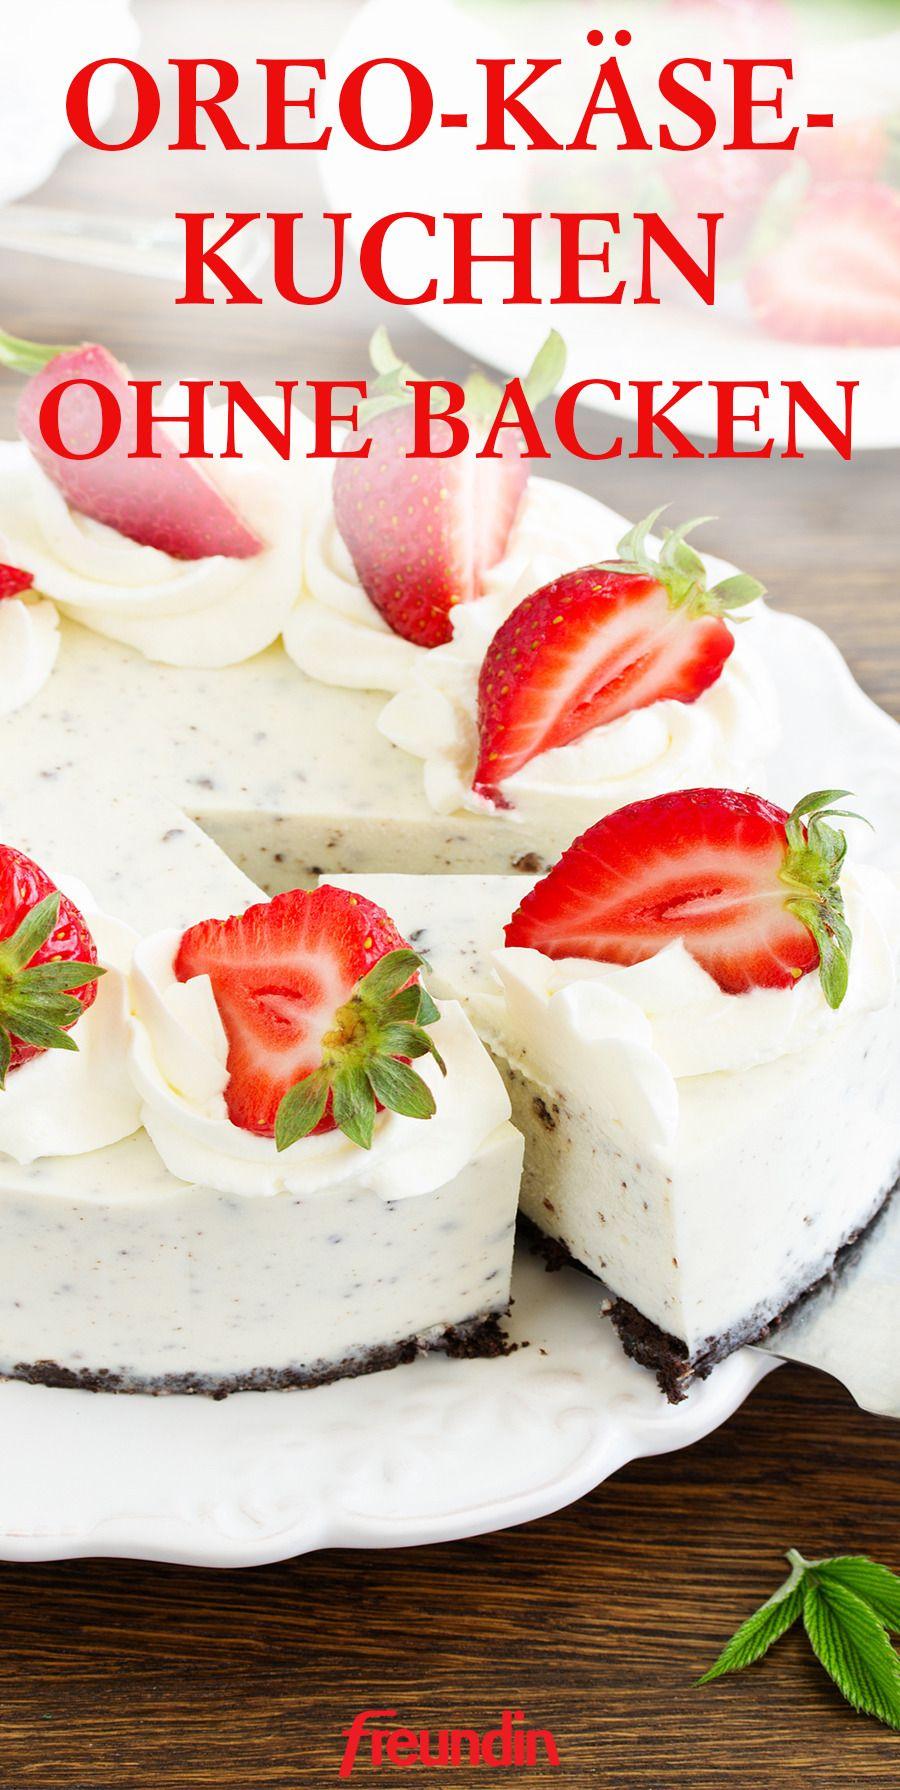 Kuchen Ohne Backen Oreo Kase Kuchen Backen Kuchen Kuchen Ohne